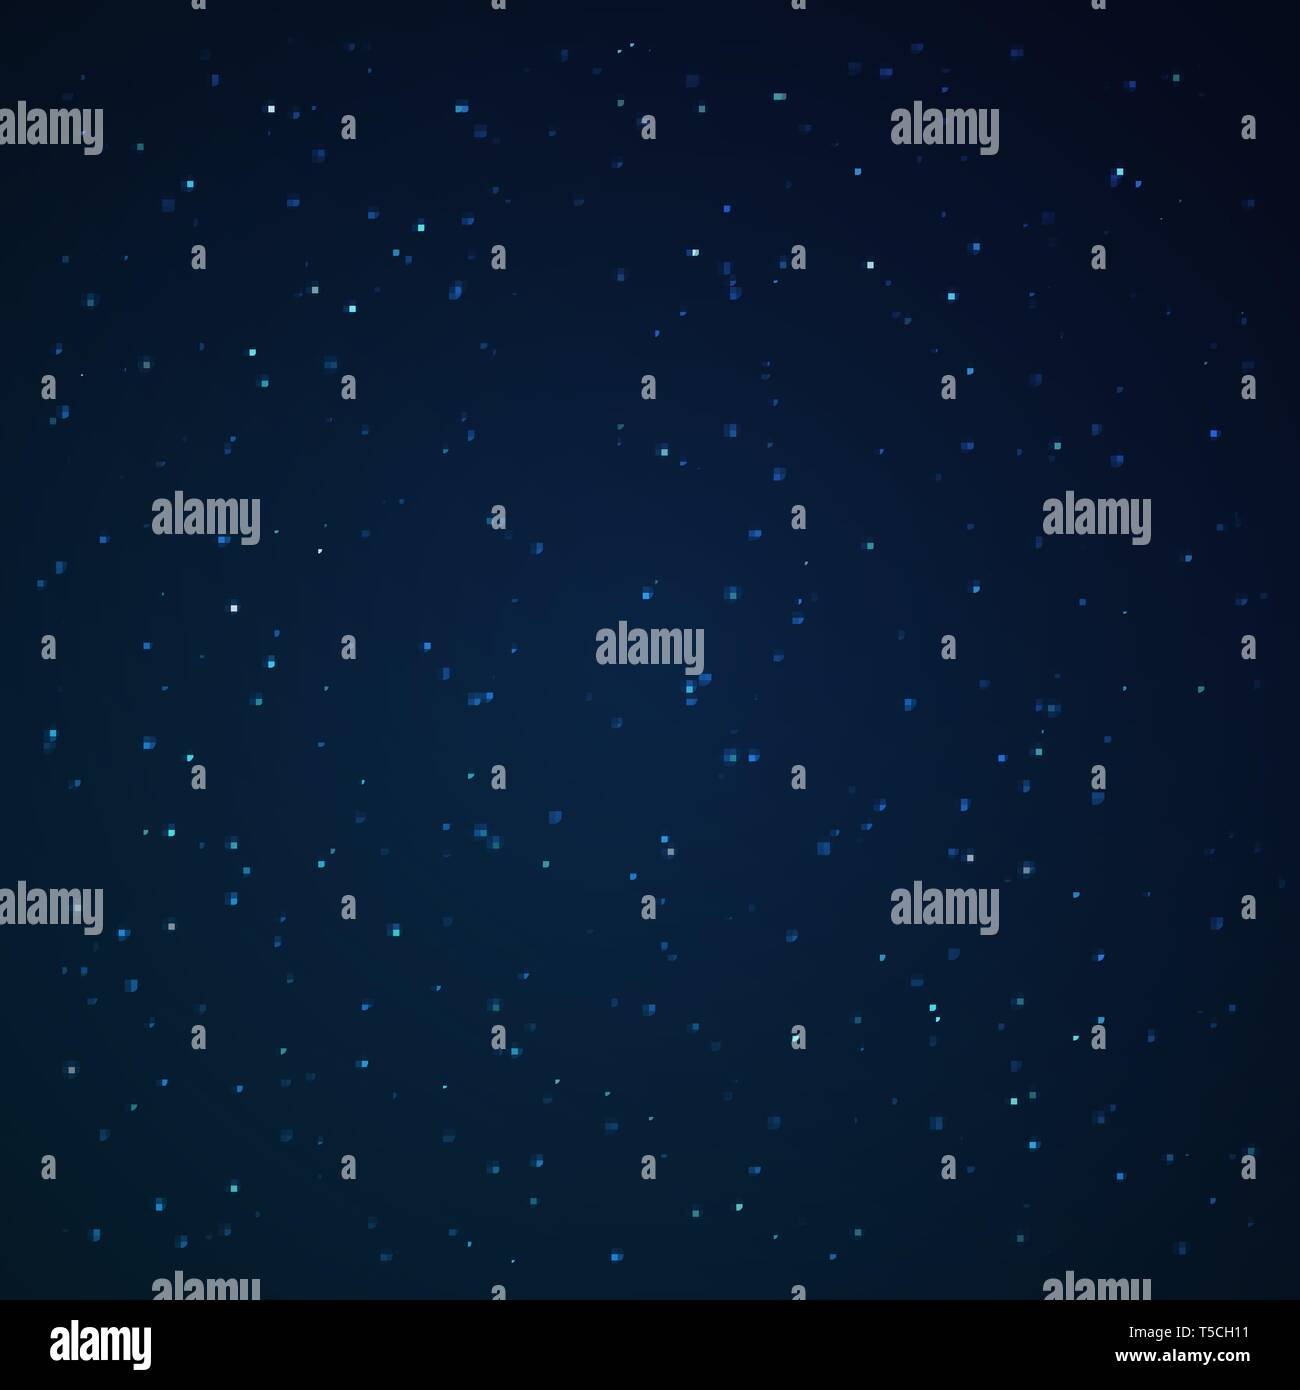 The star studded sky. Vector illustration. Stellar galaxy - Stock Vector